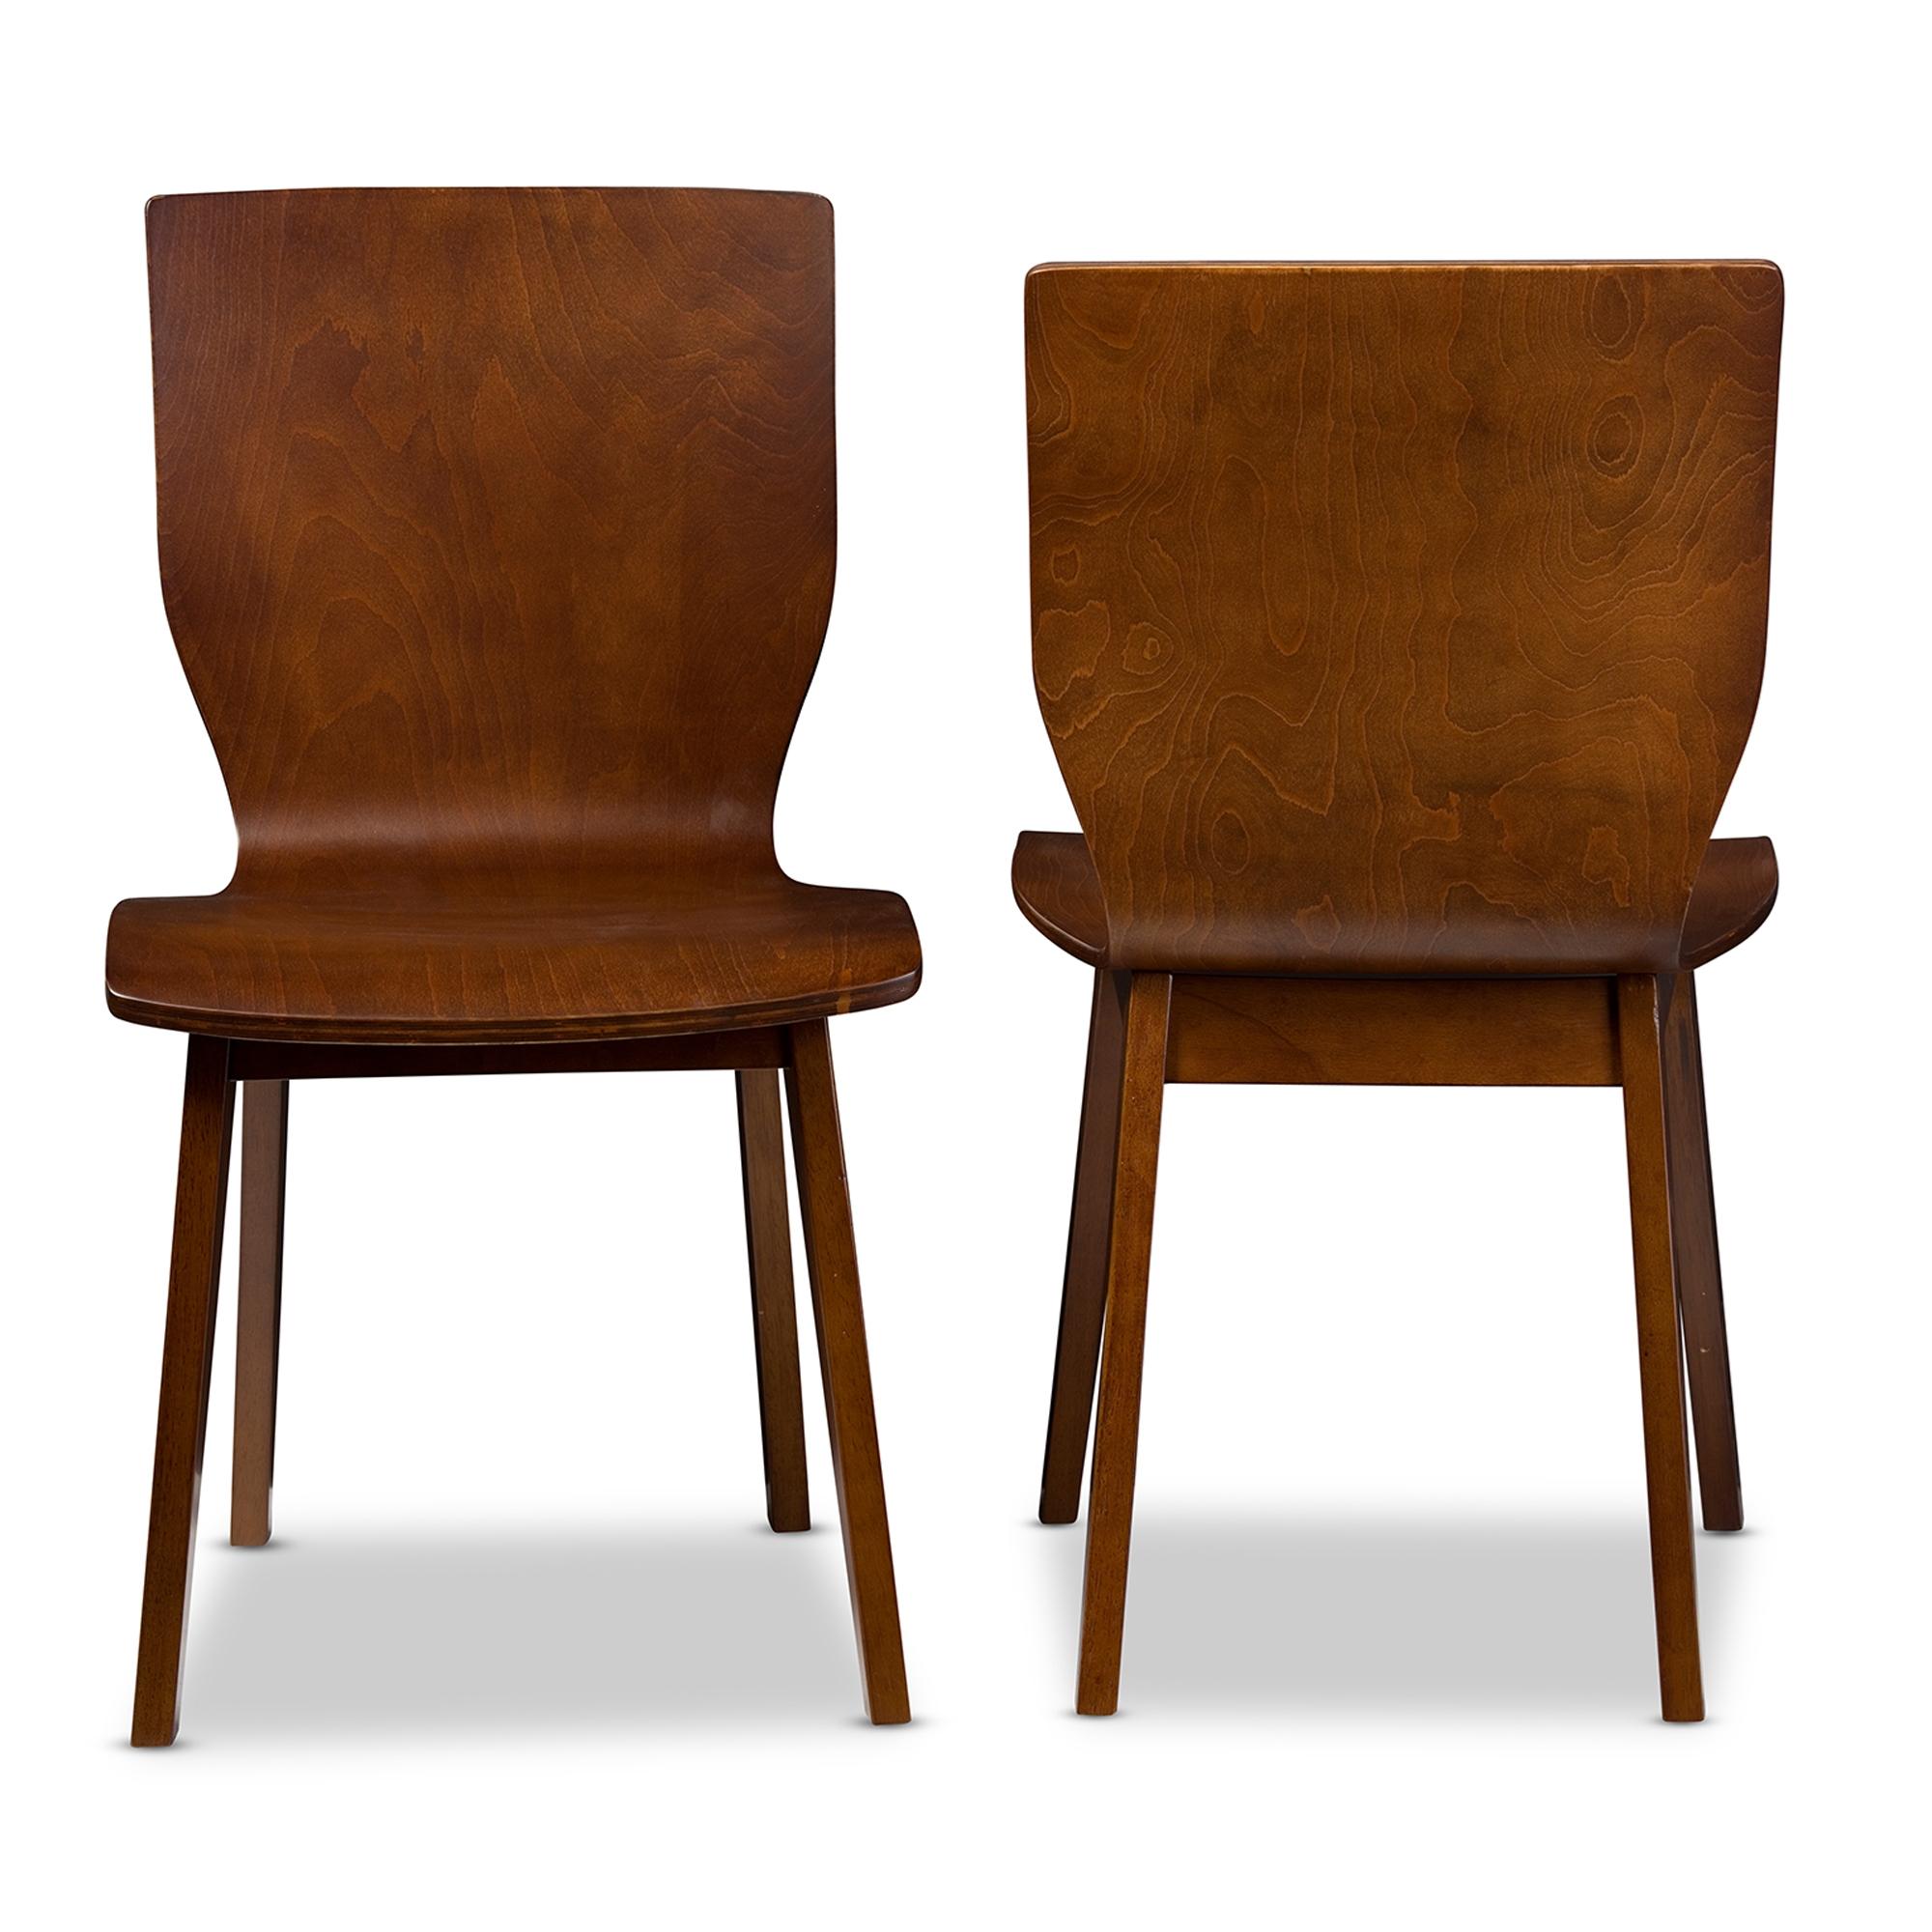 dark brown wooden dining chairs plastic office chair baxton studio elsa mid century modern scandinavian style walnut bent wood